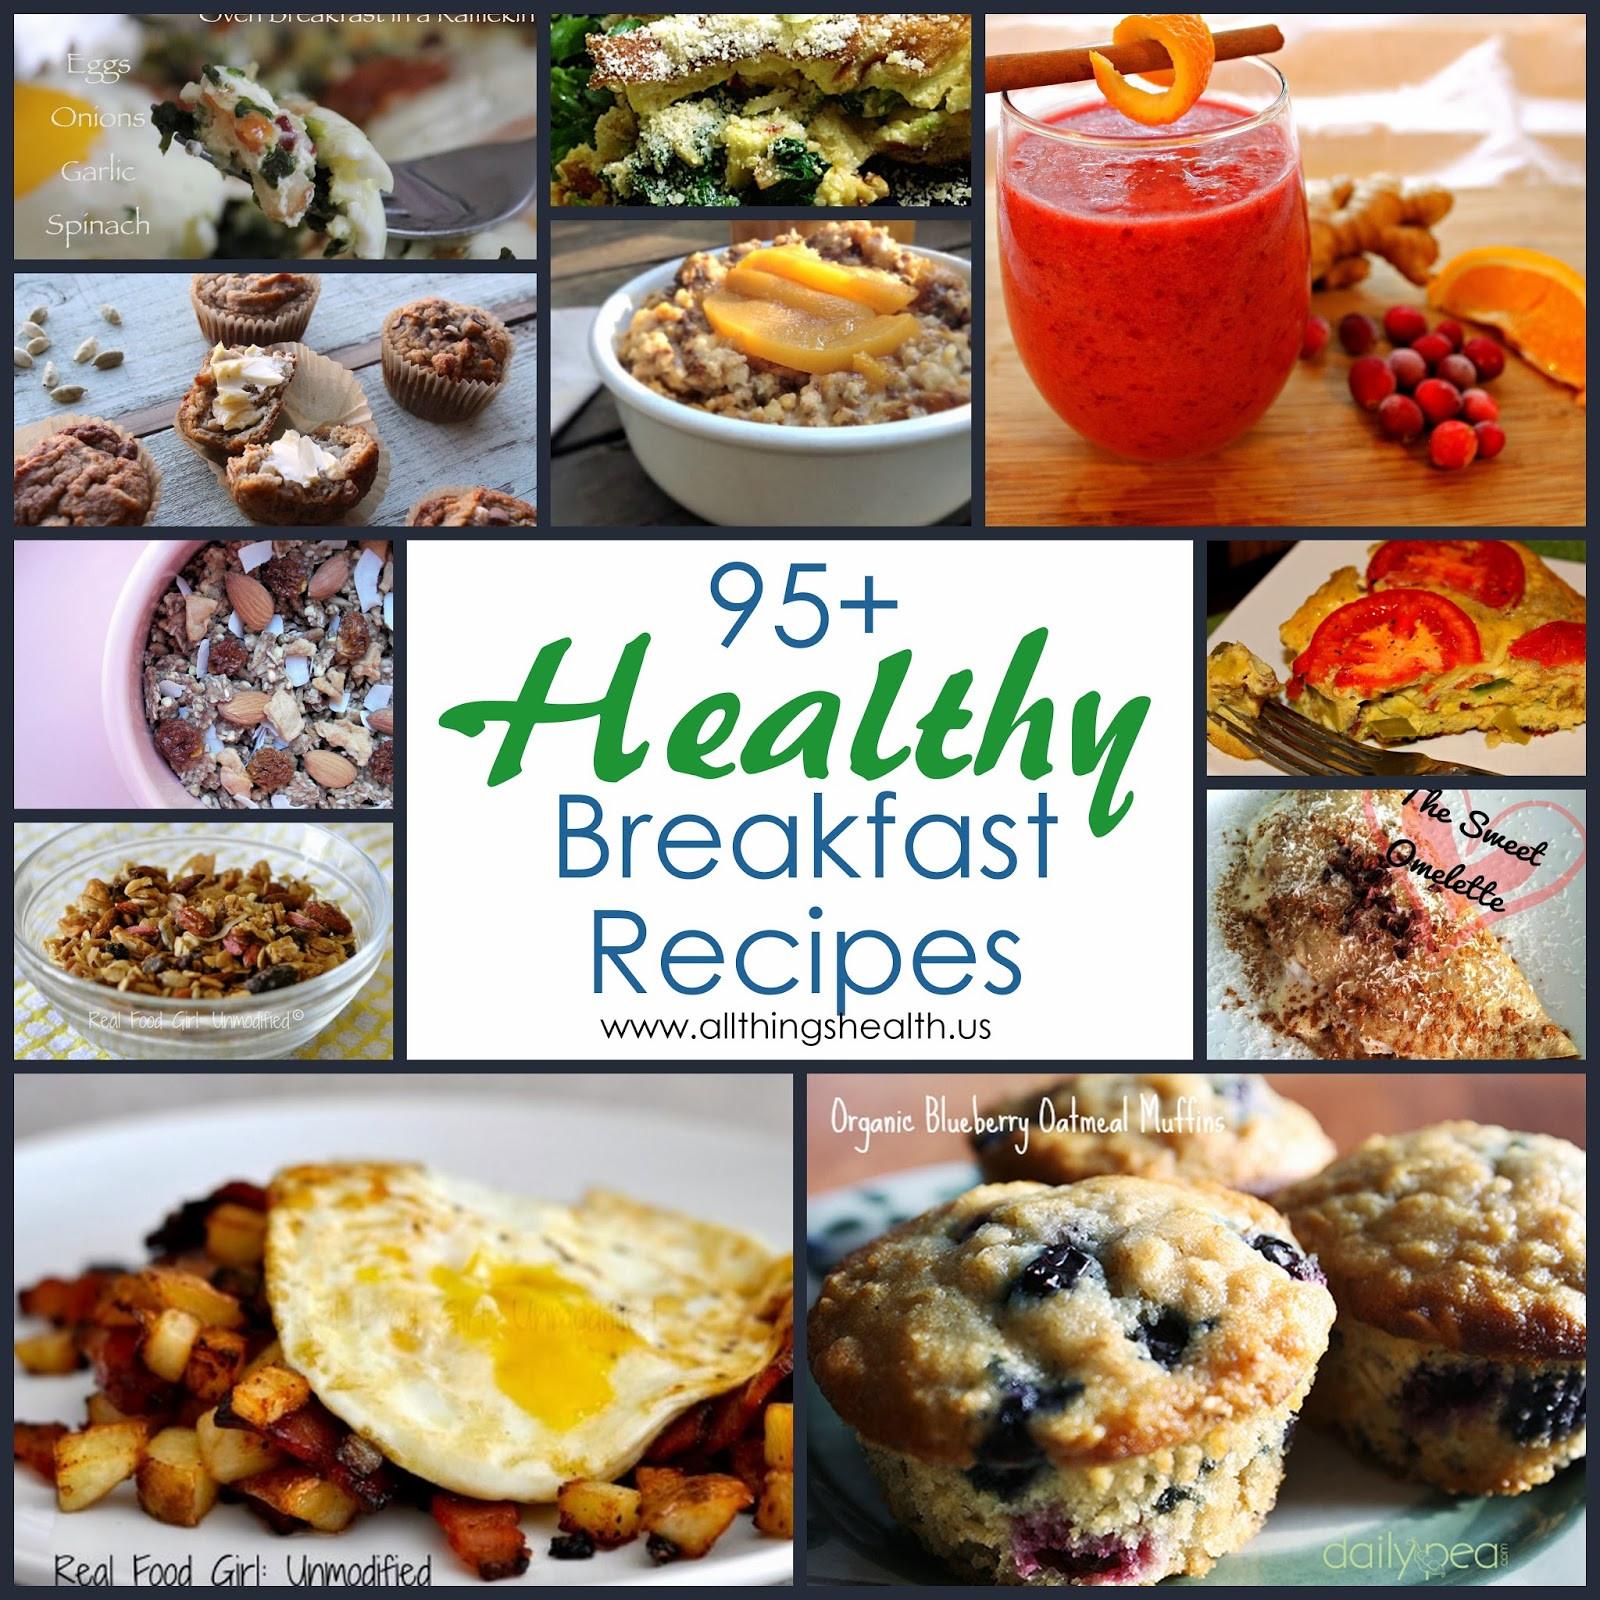 Healthy Breakfast Food  All Things Health 95 Healthy Breakfast Recipes